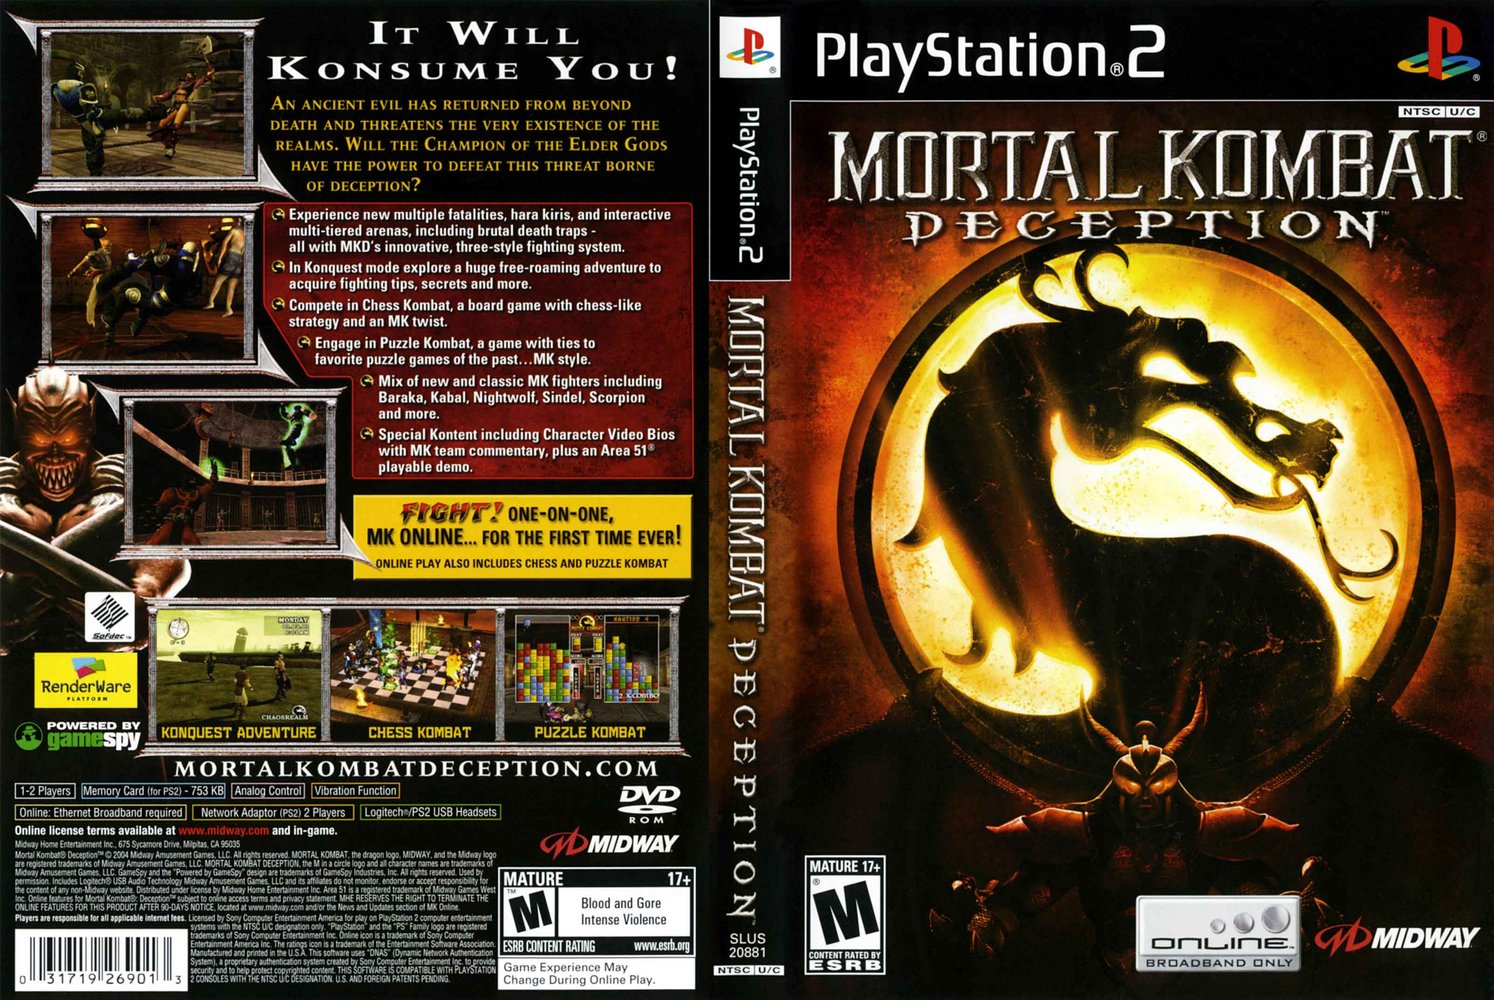 Mortal kombat Ntsc Ps2